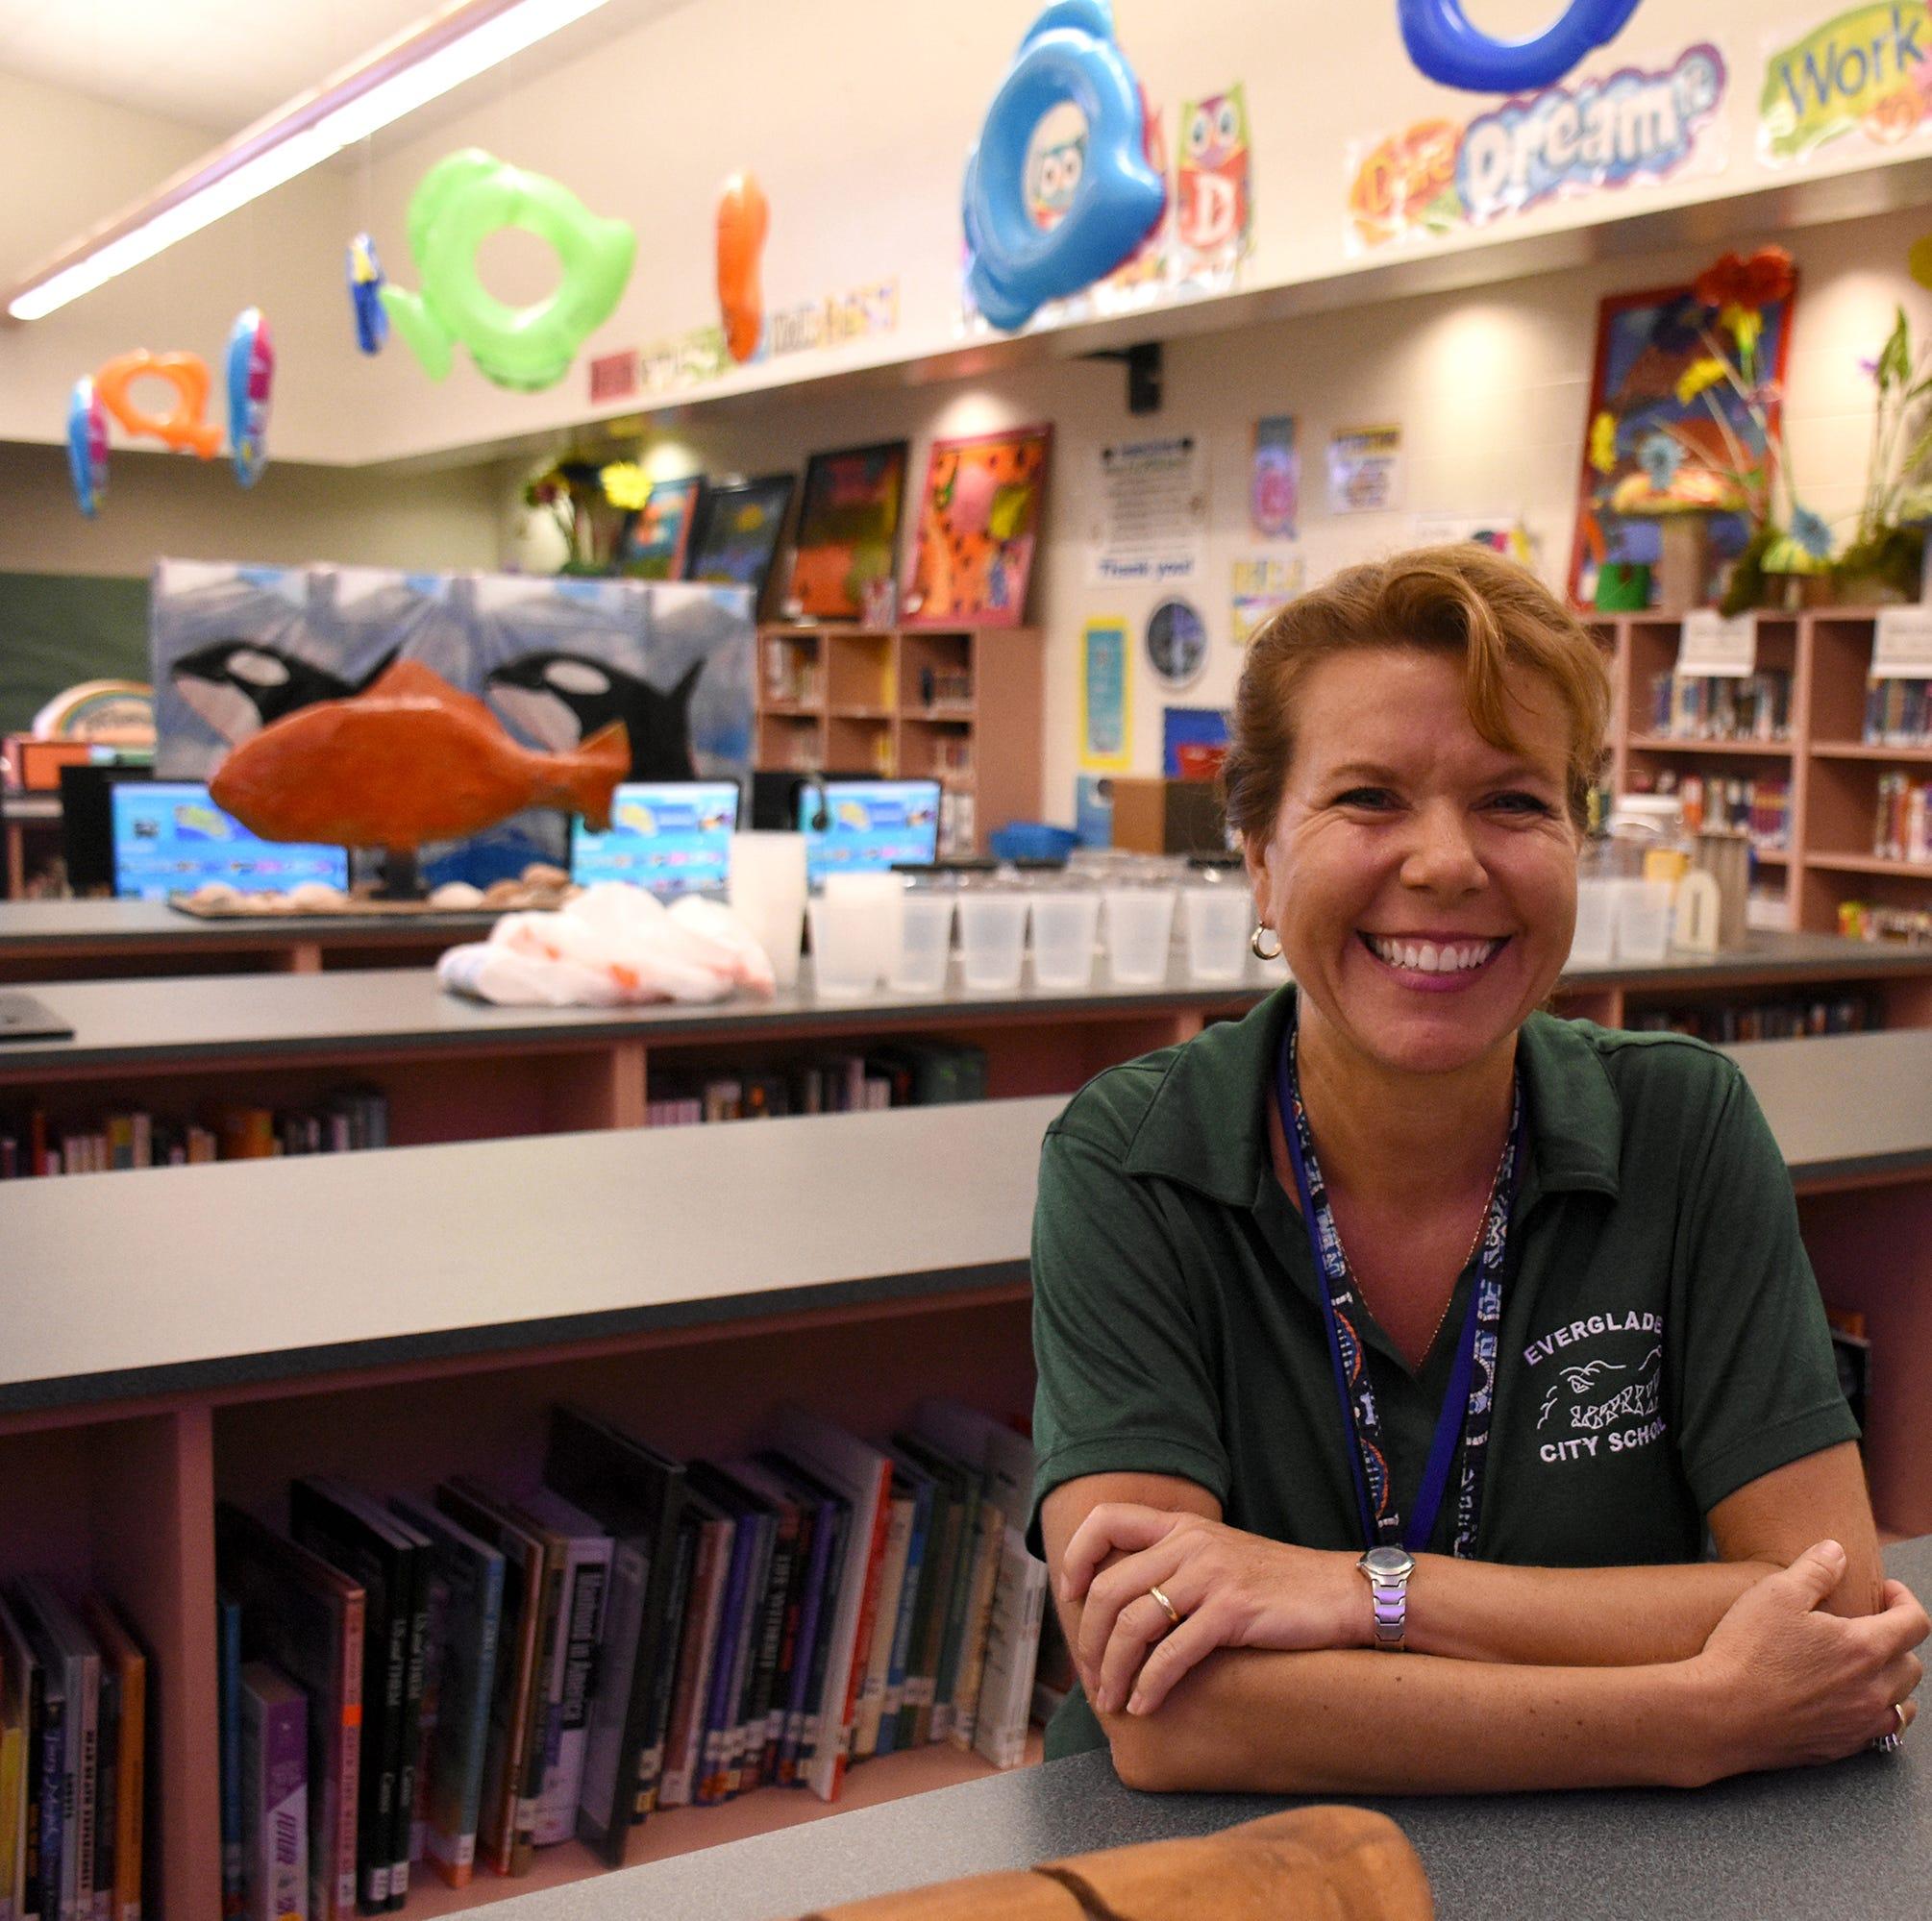 Everglades City School: A cornerstone for the community